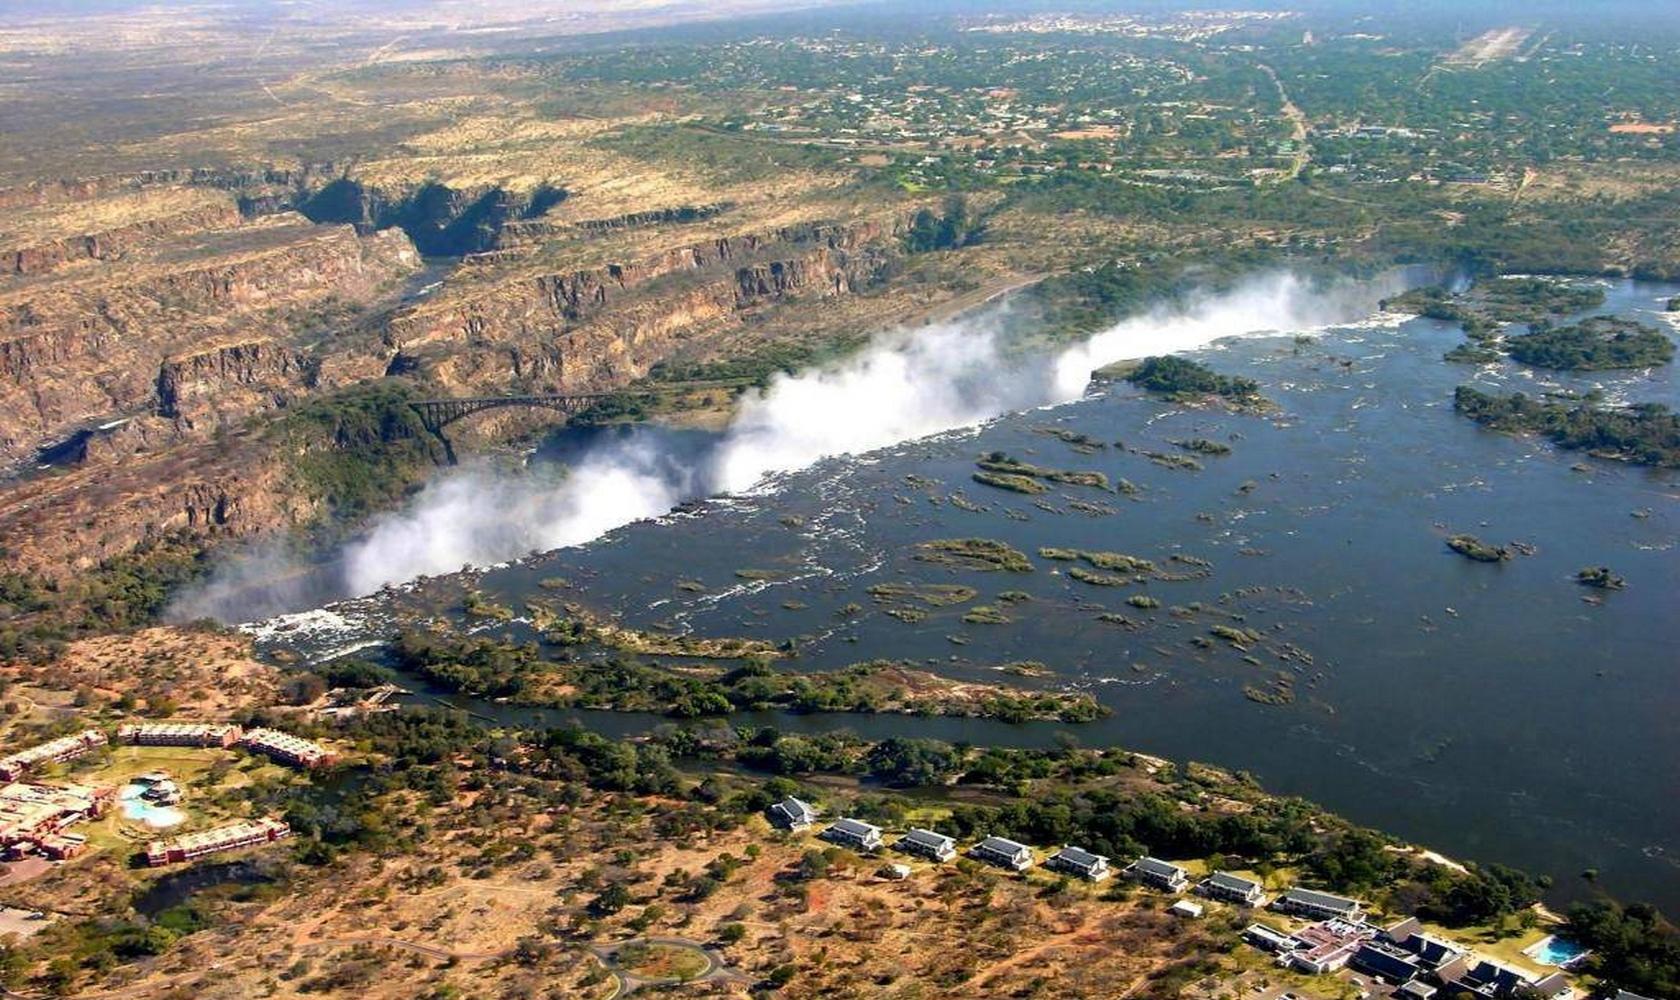 Africa_Chutes_Victoria_004-1680-1000.jpg